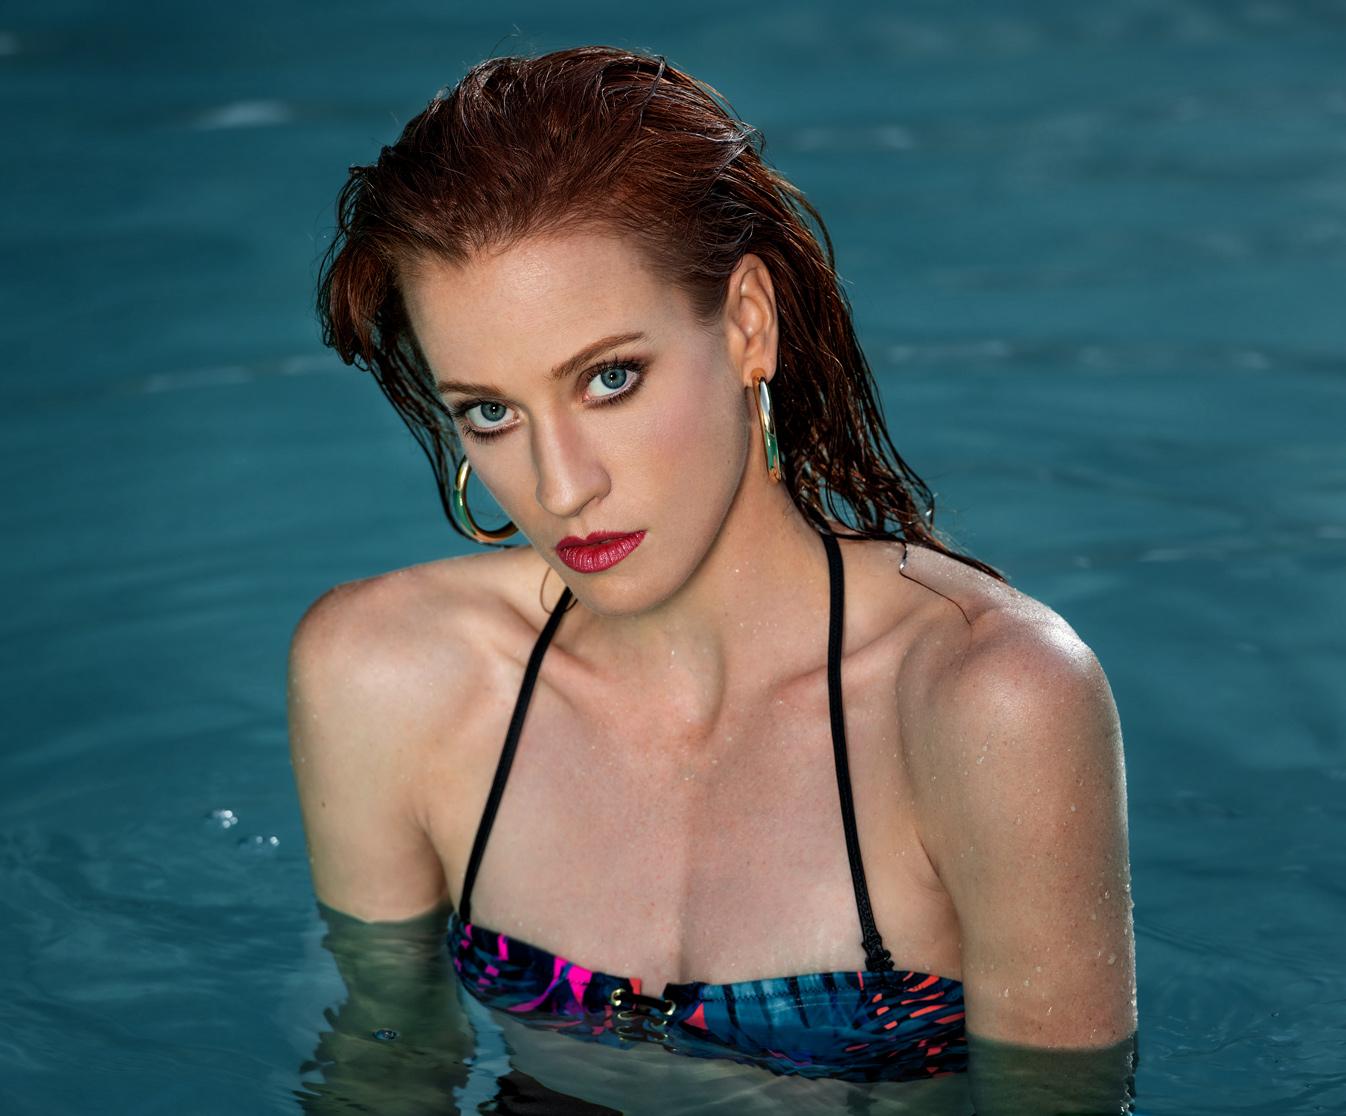 headshot of model in swimming pool